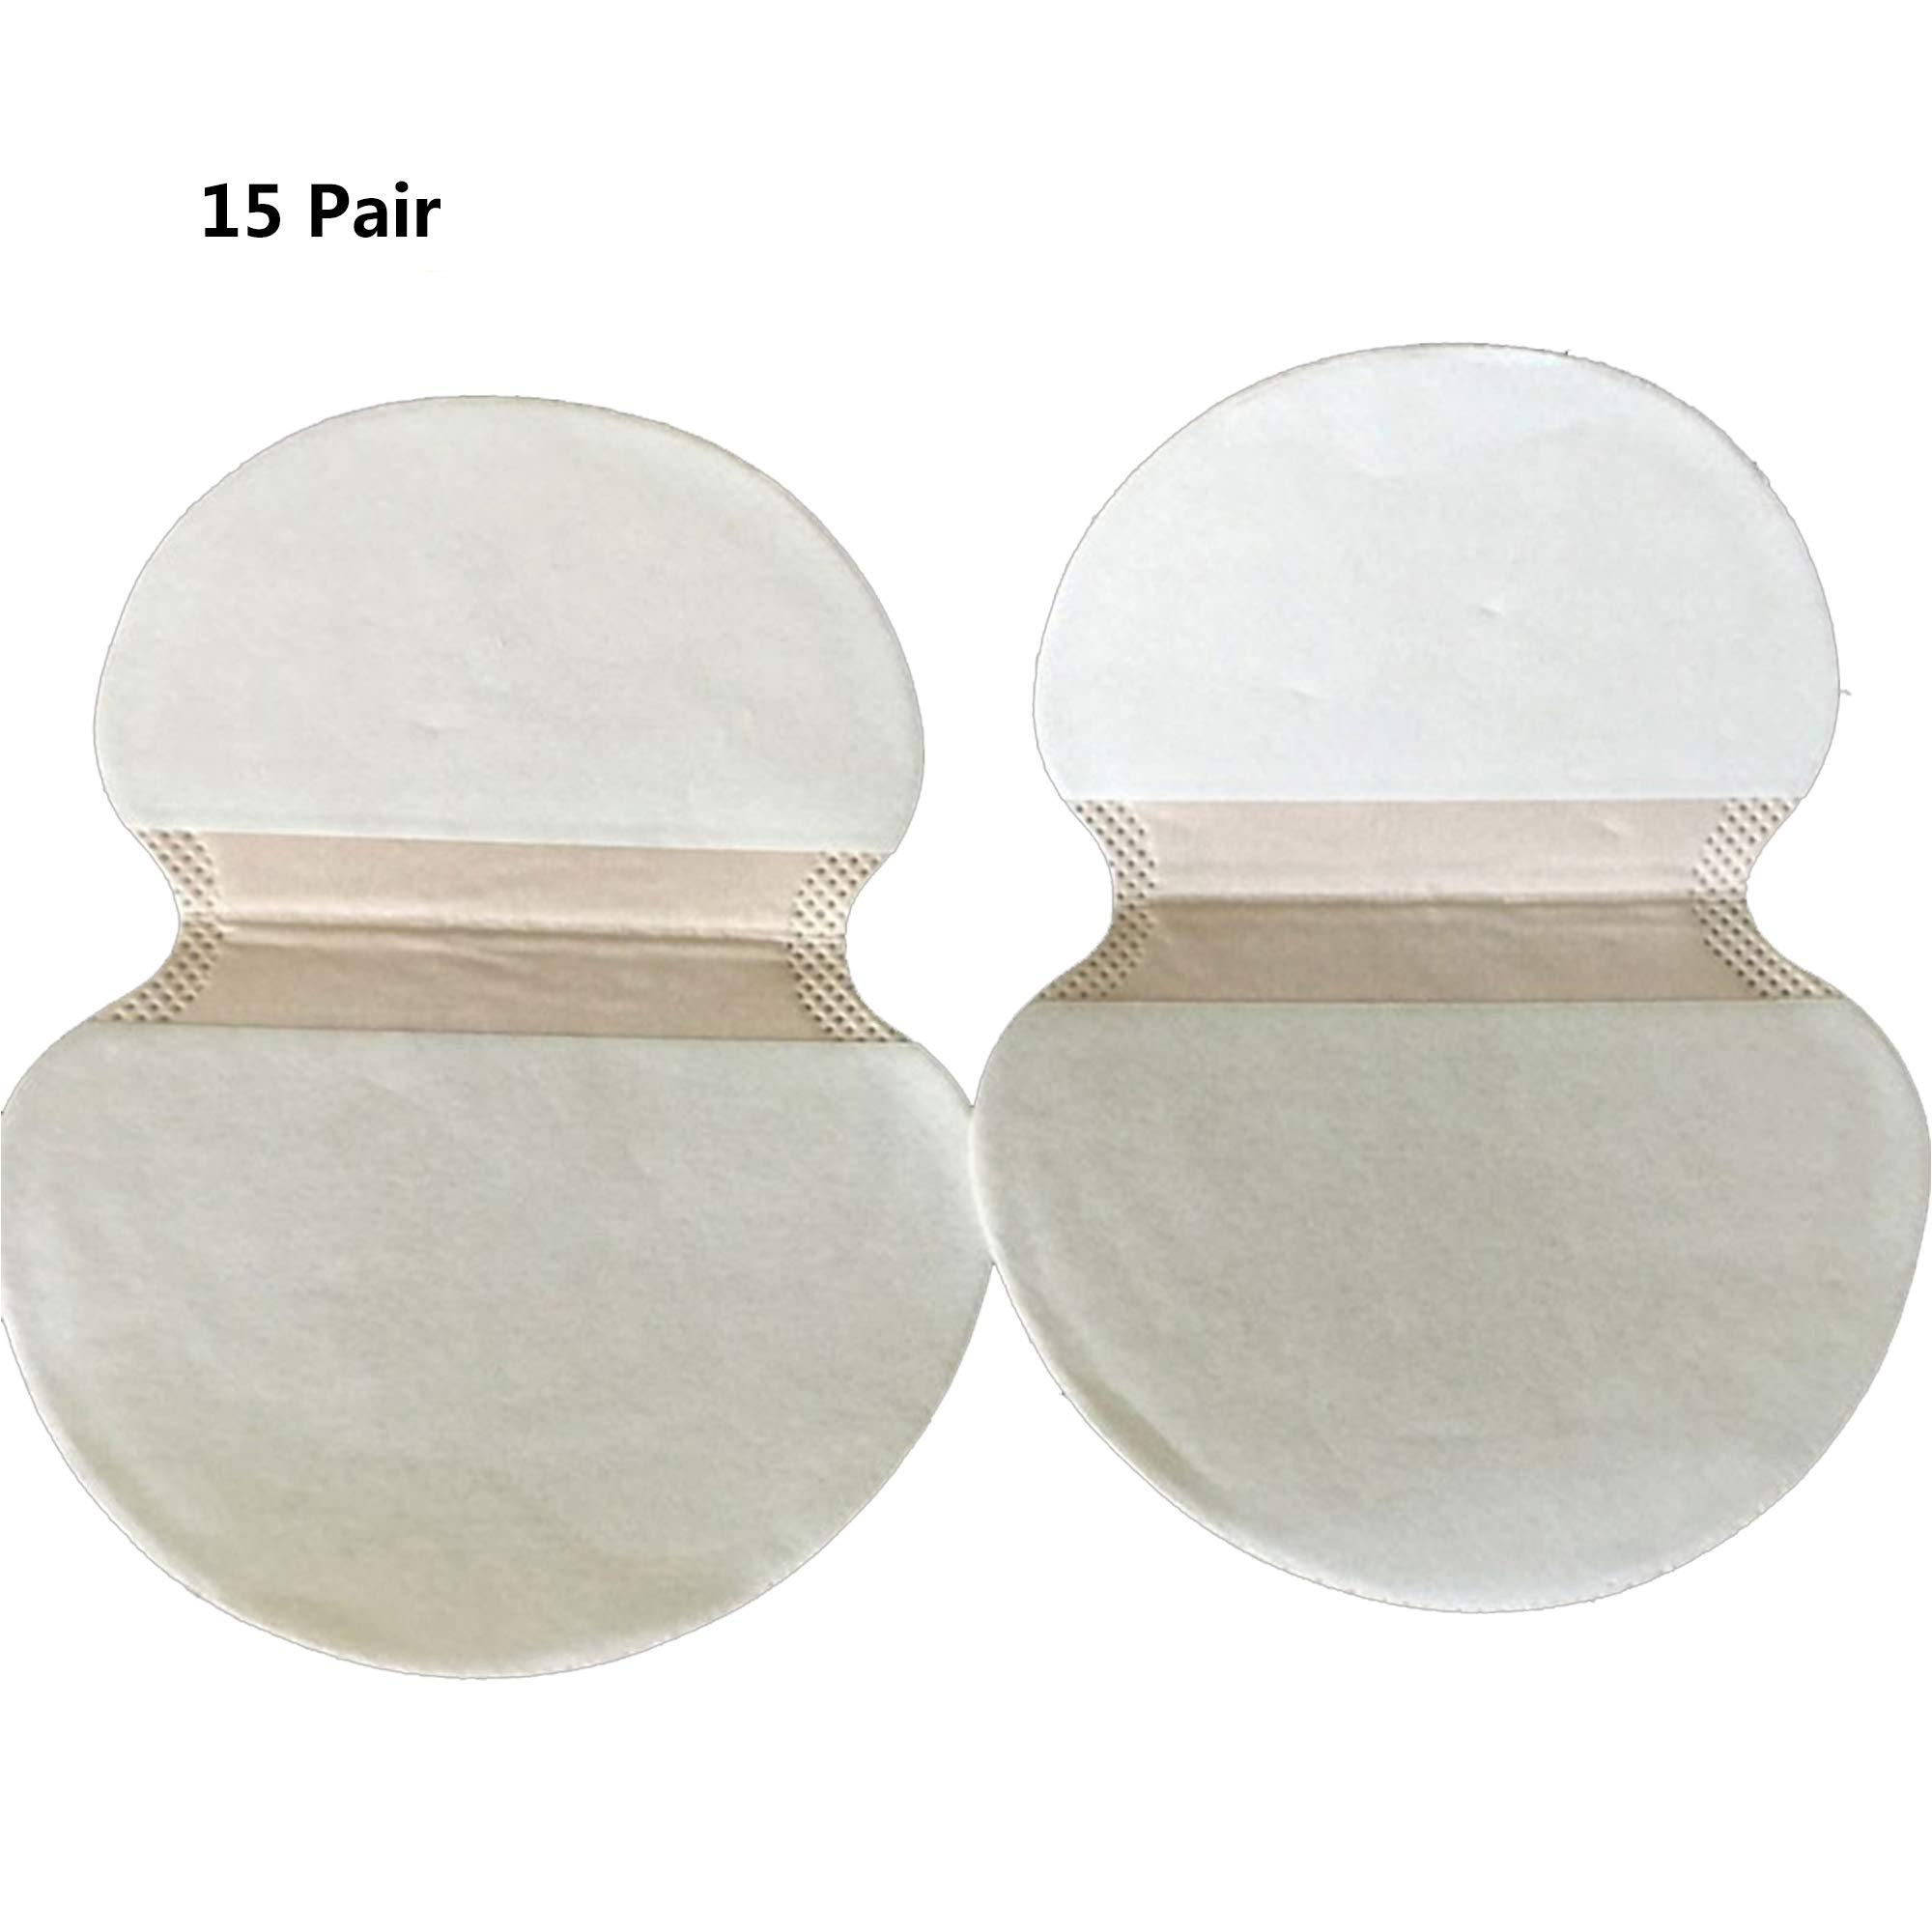 Underarm Sweat Pad, Disposable Absorbent Underarm Shields Antiperspirant Adhesive Underarm Pad Armpit pad Comfortable Discreet Sweat Free Odor Free (15 Pair)